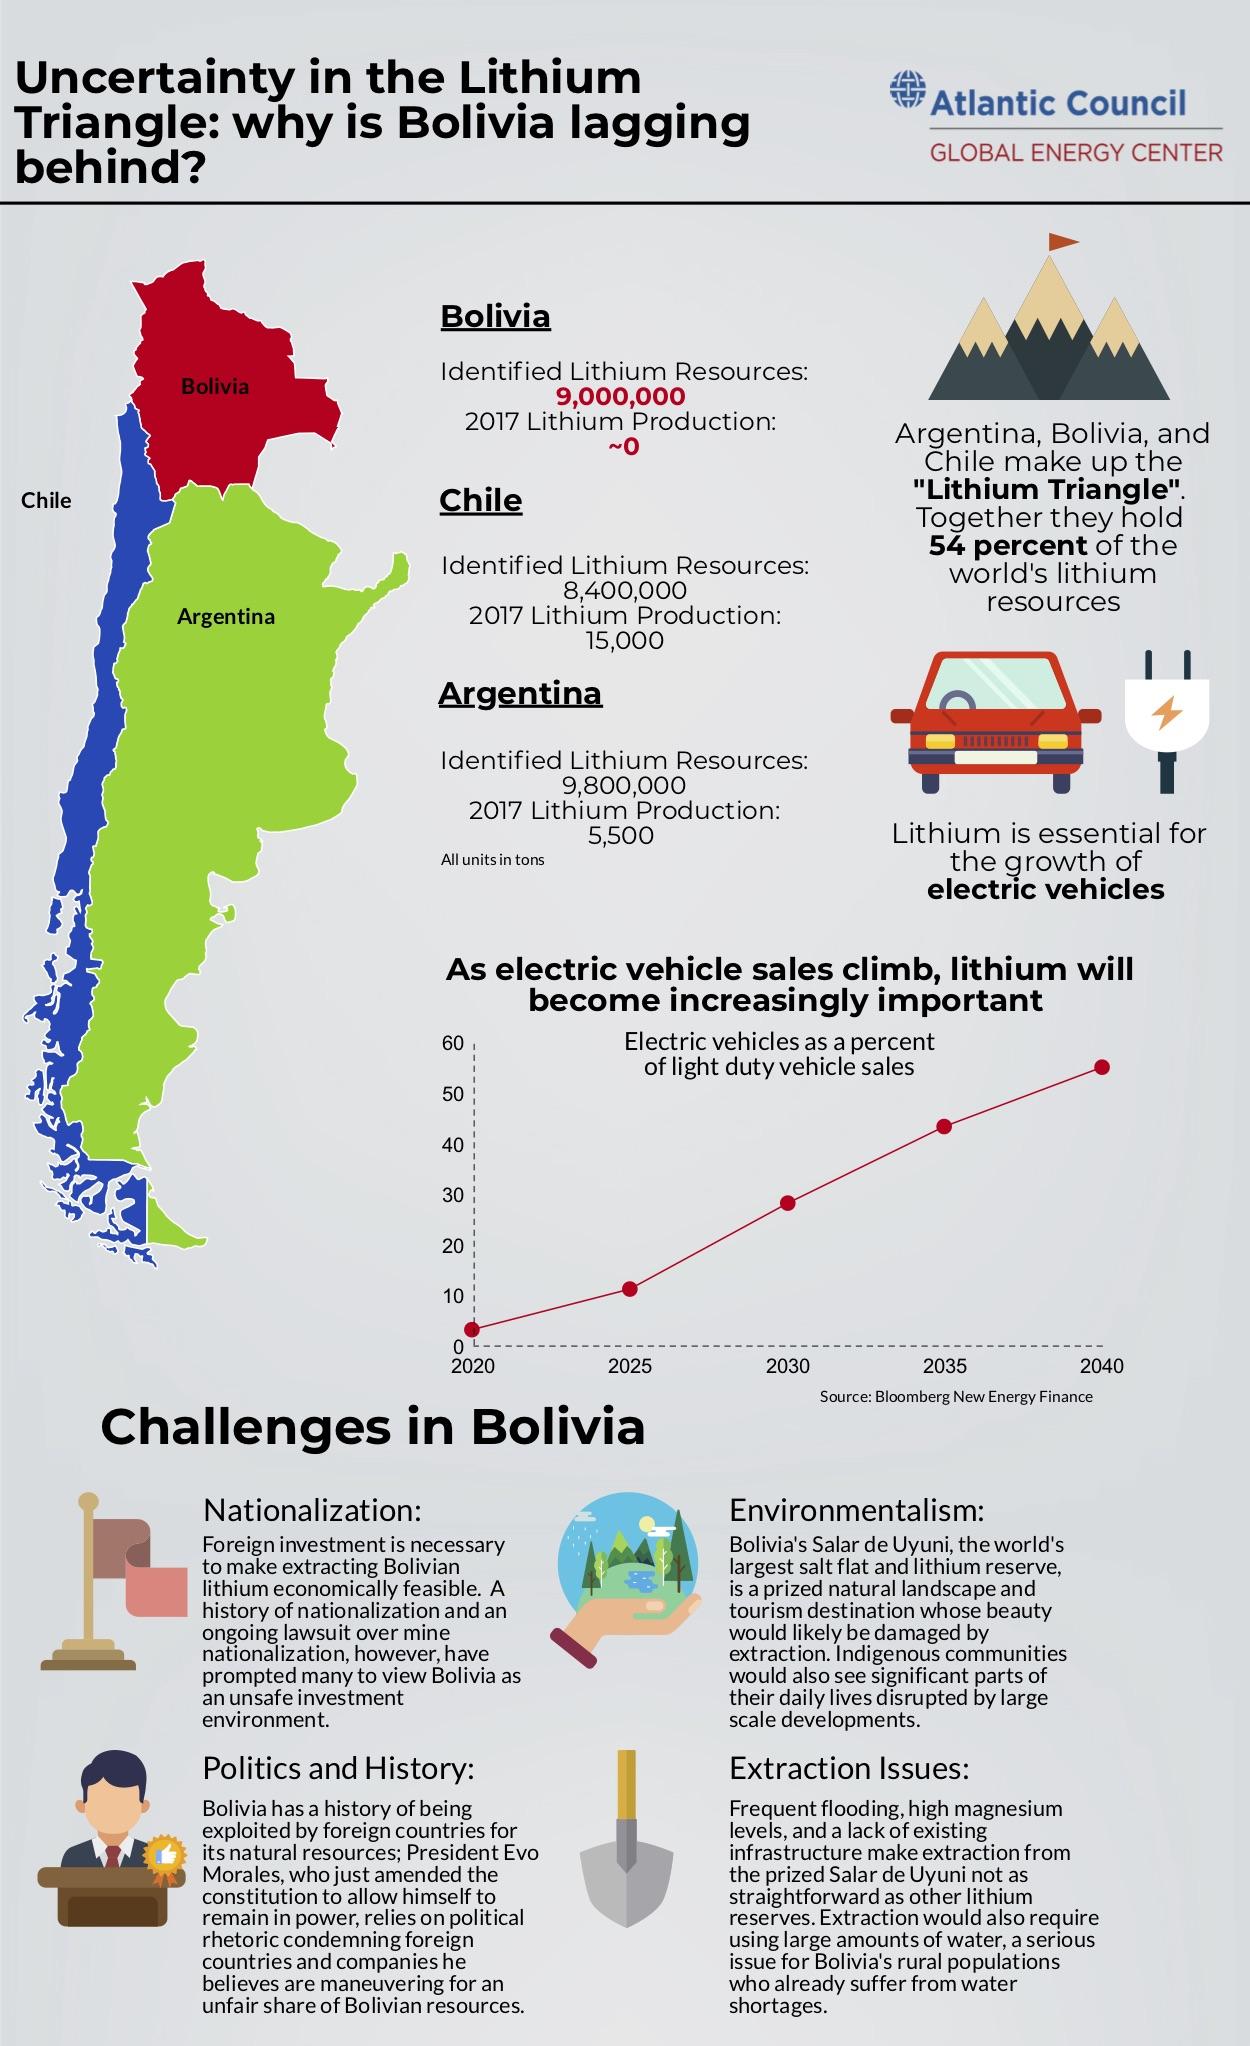 Bolivian Lithium Infographic